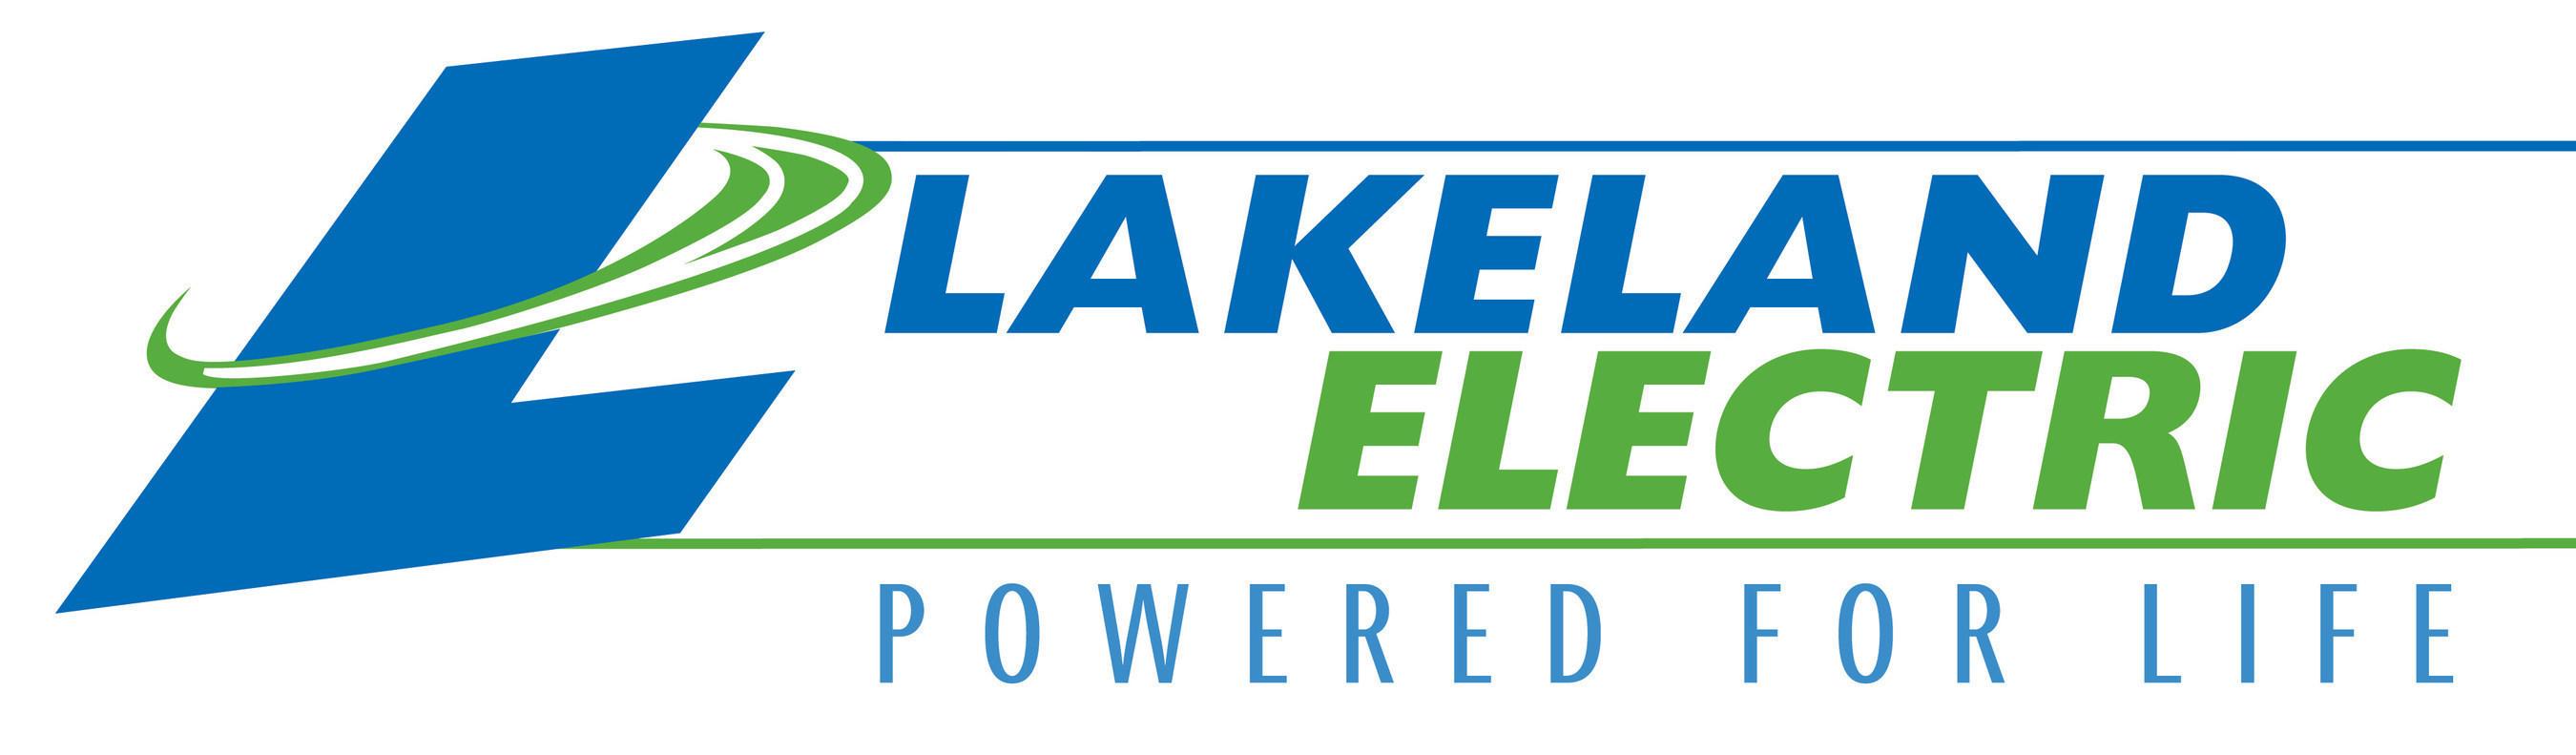 SunEdison termina planta de energía solar de 6 megavatios para Lakeland Electric en Lakeland,